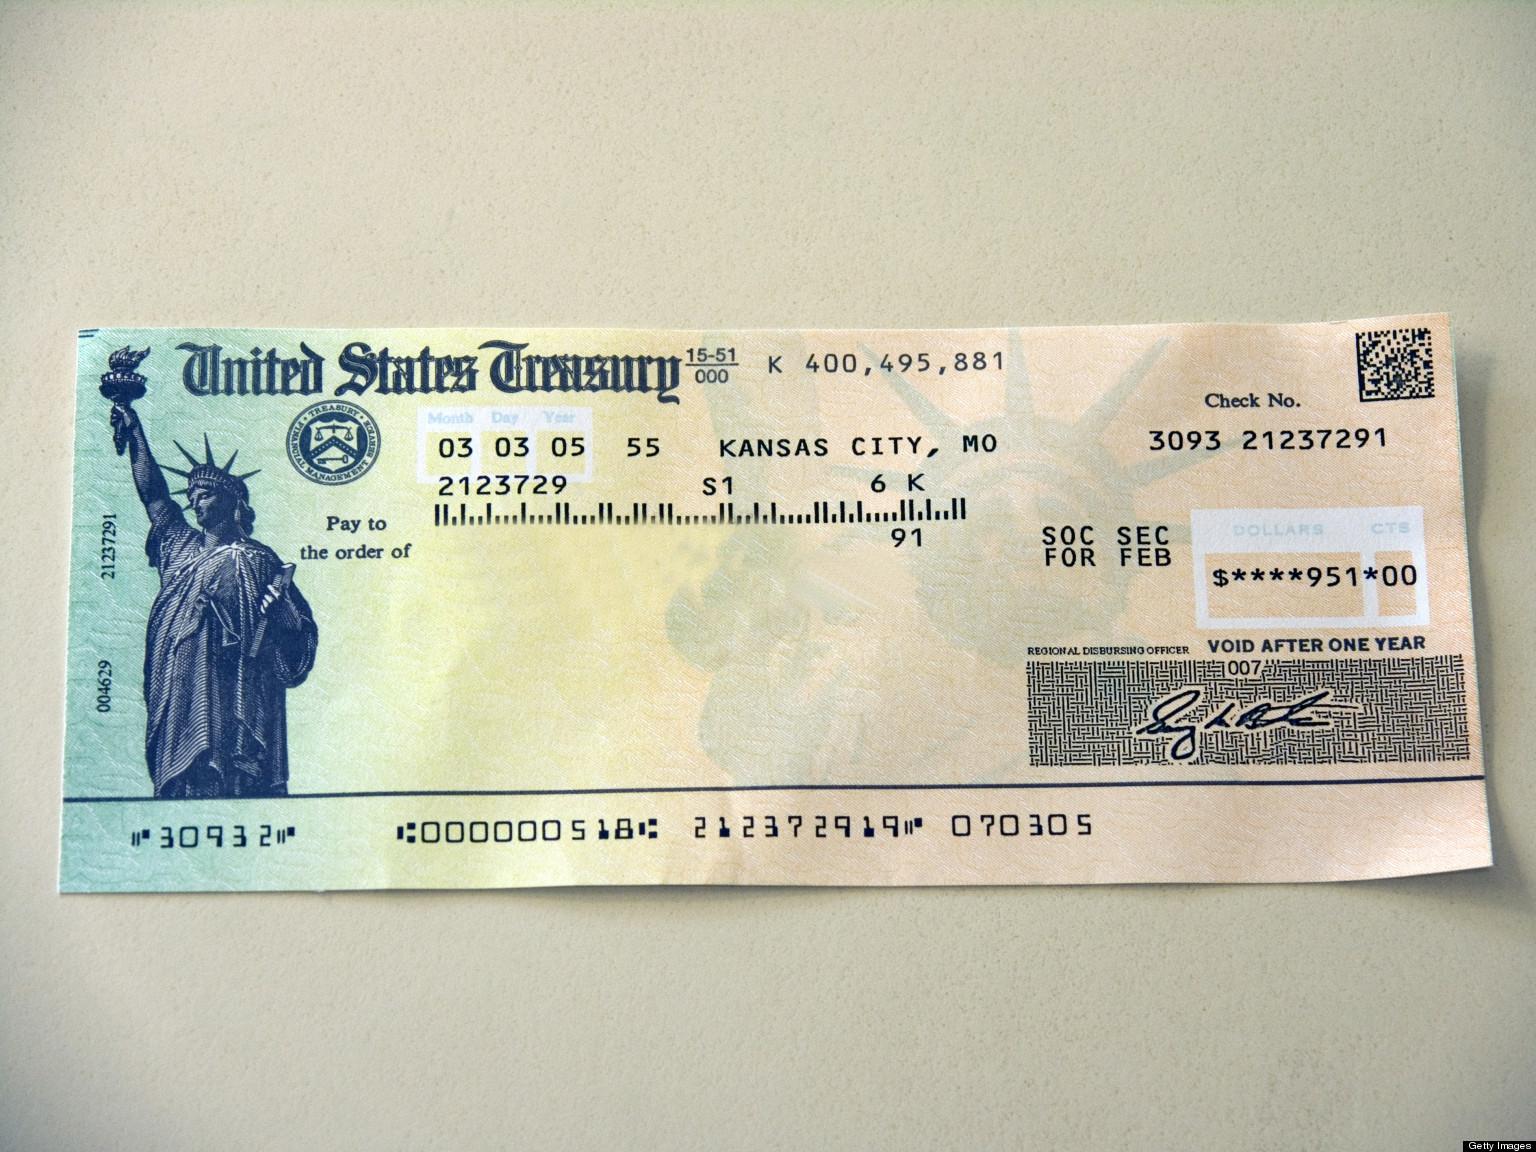 get social security number: